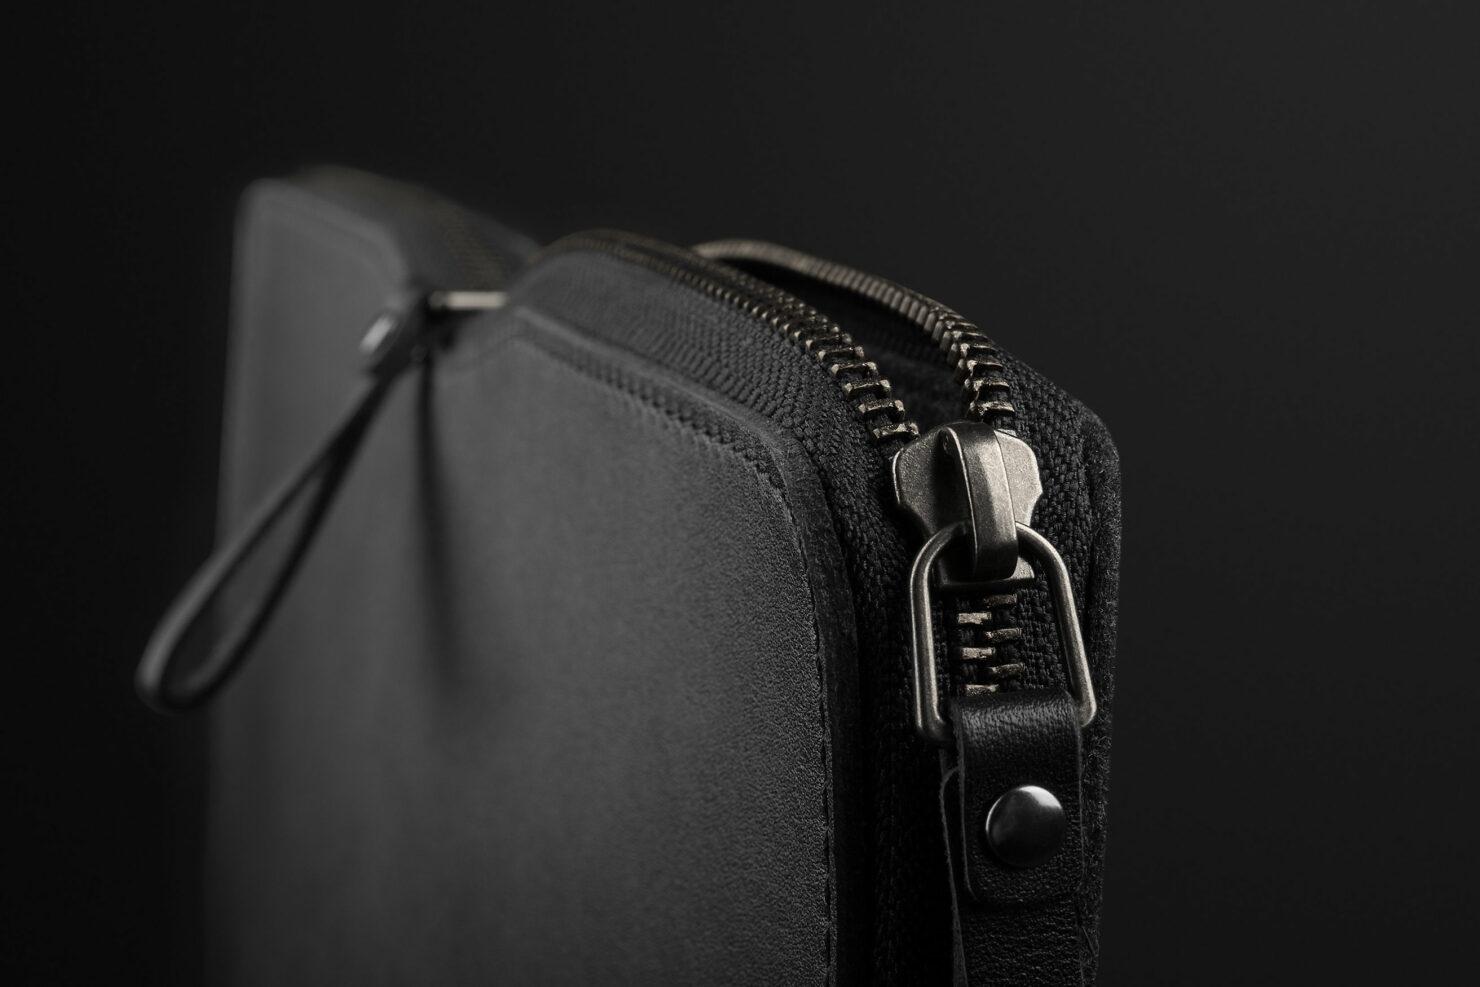 folio-sleeve-for-1322-macbook-air-pro-black-06